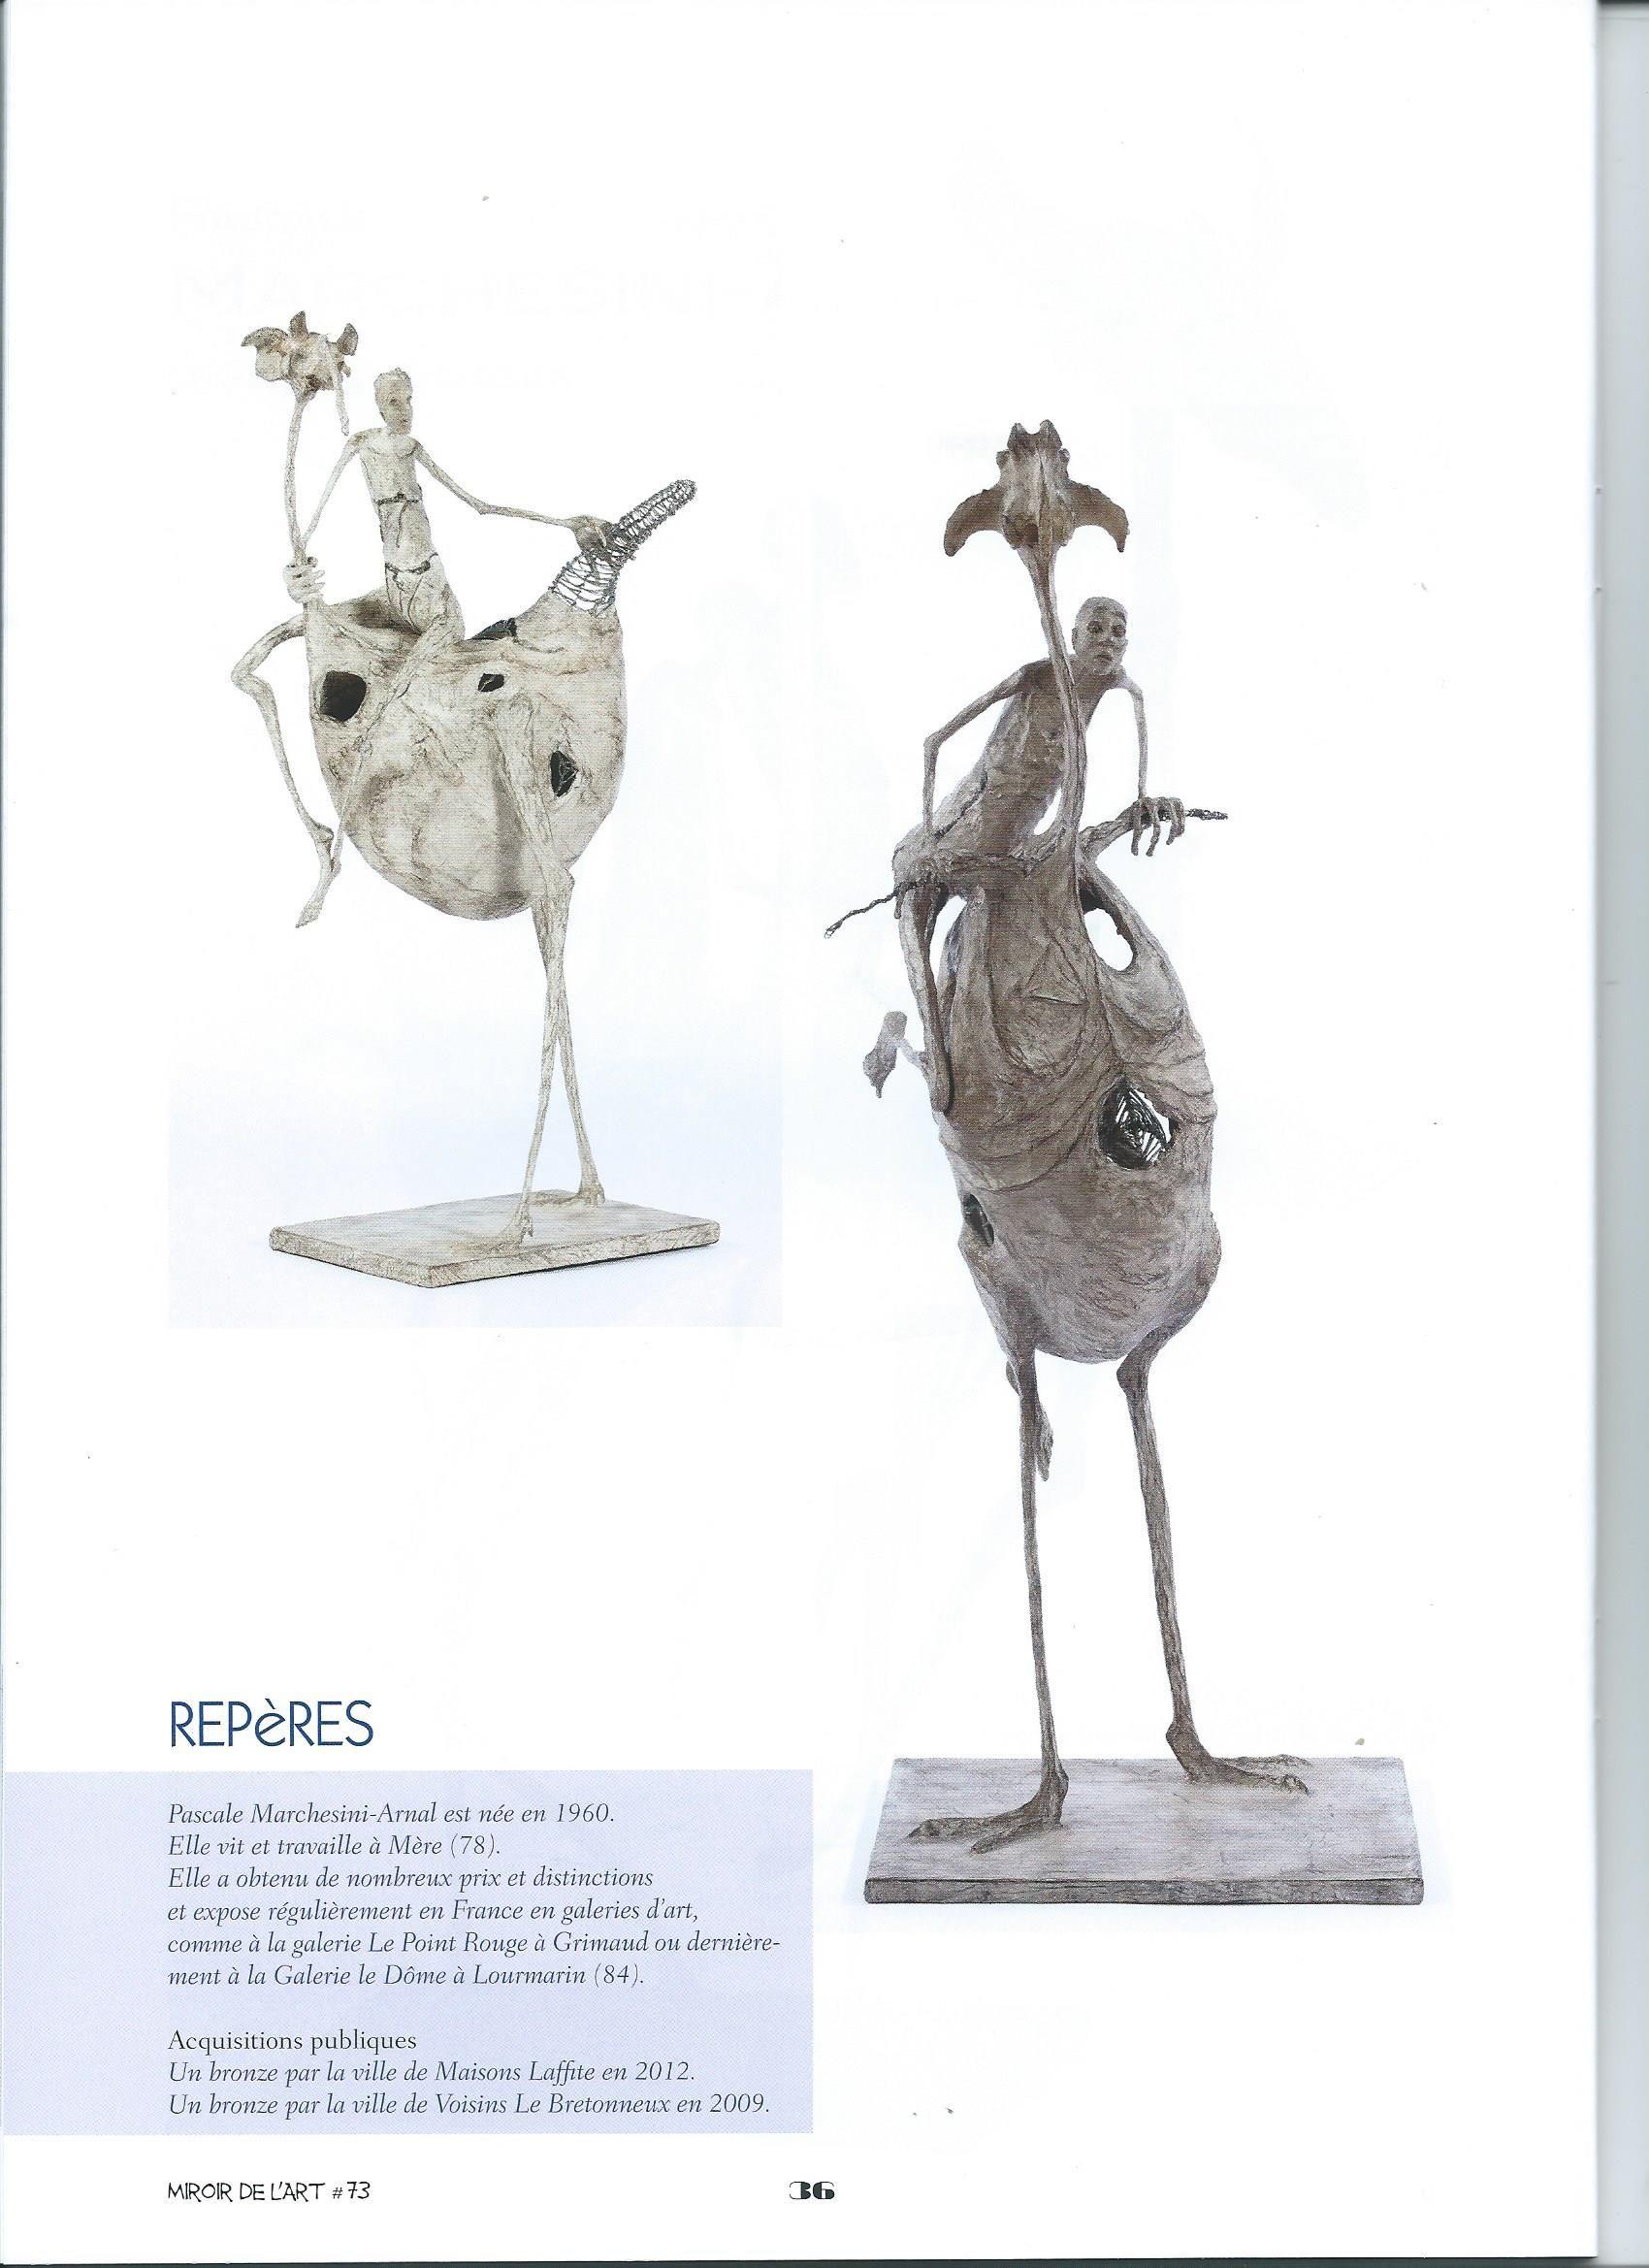 Miroir de l'Art n°73 - 3